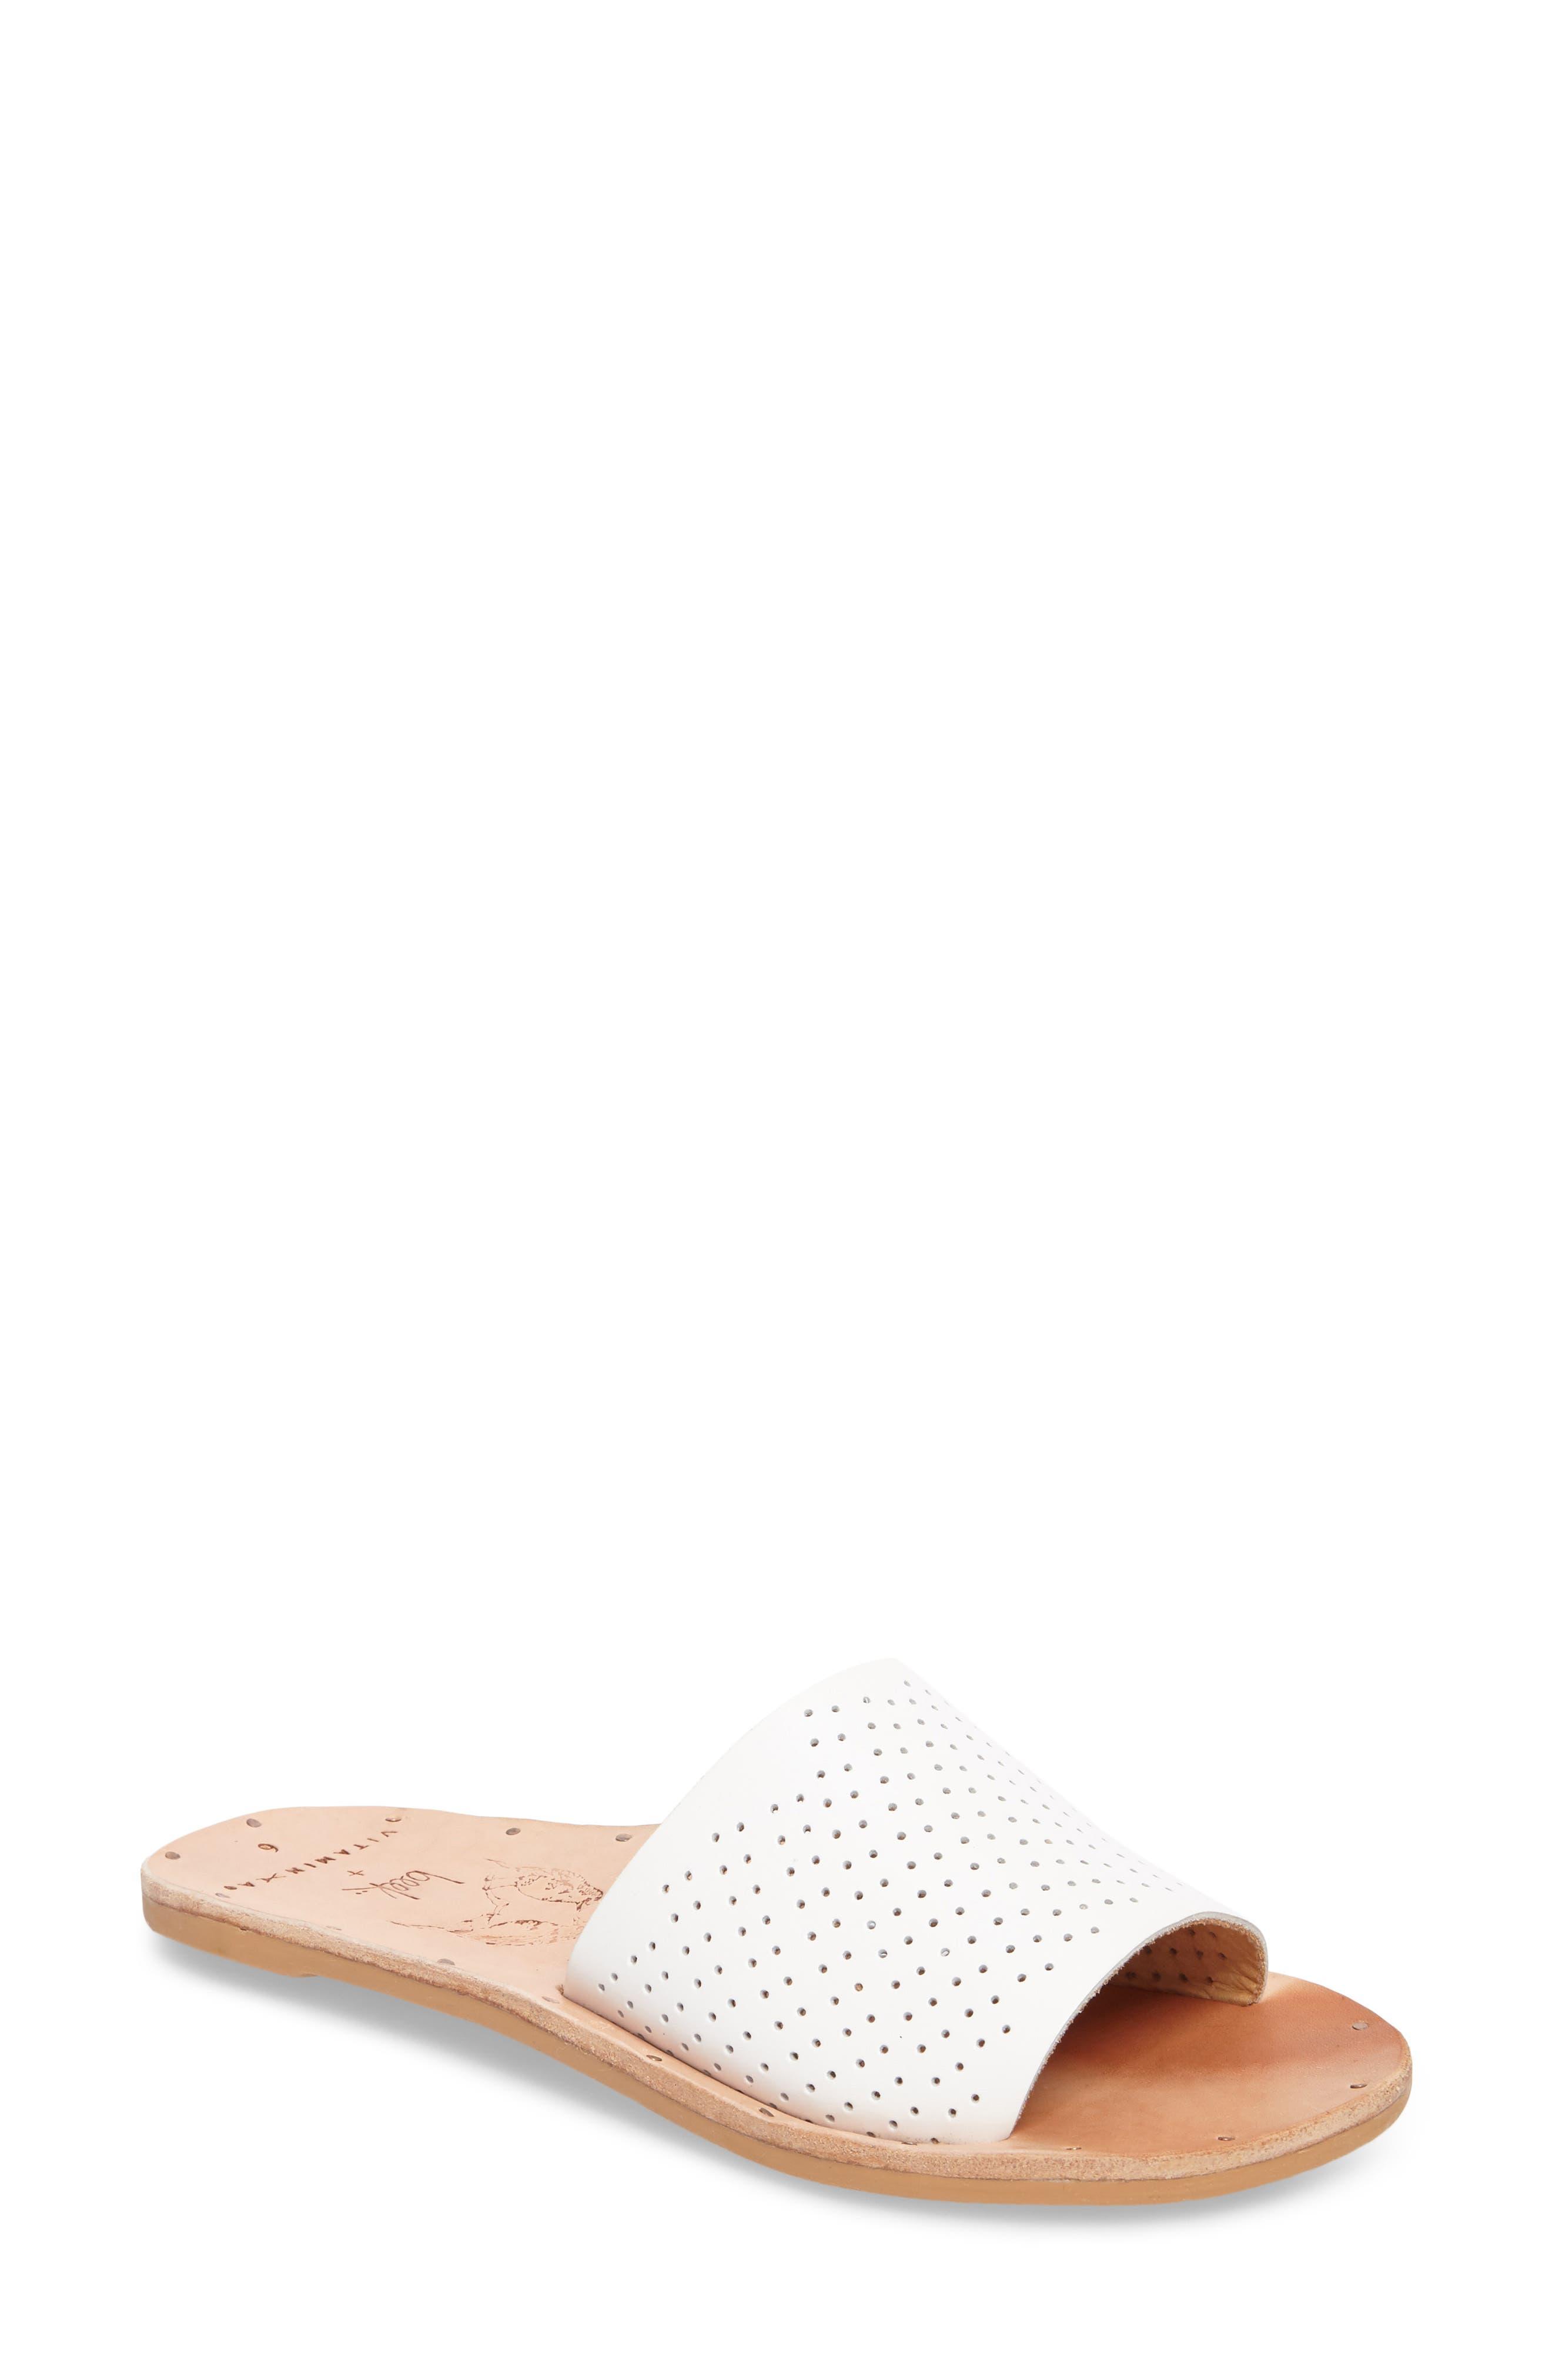 Alternate Image 1 Selected - Beek Mockingbird Sandal (Women)